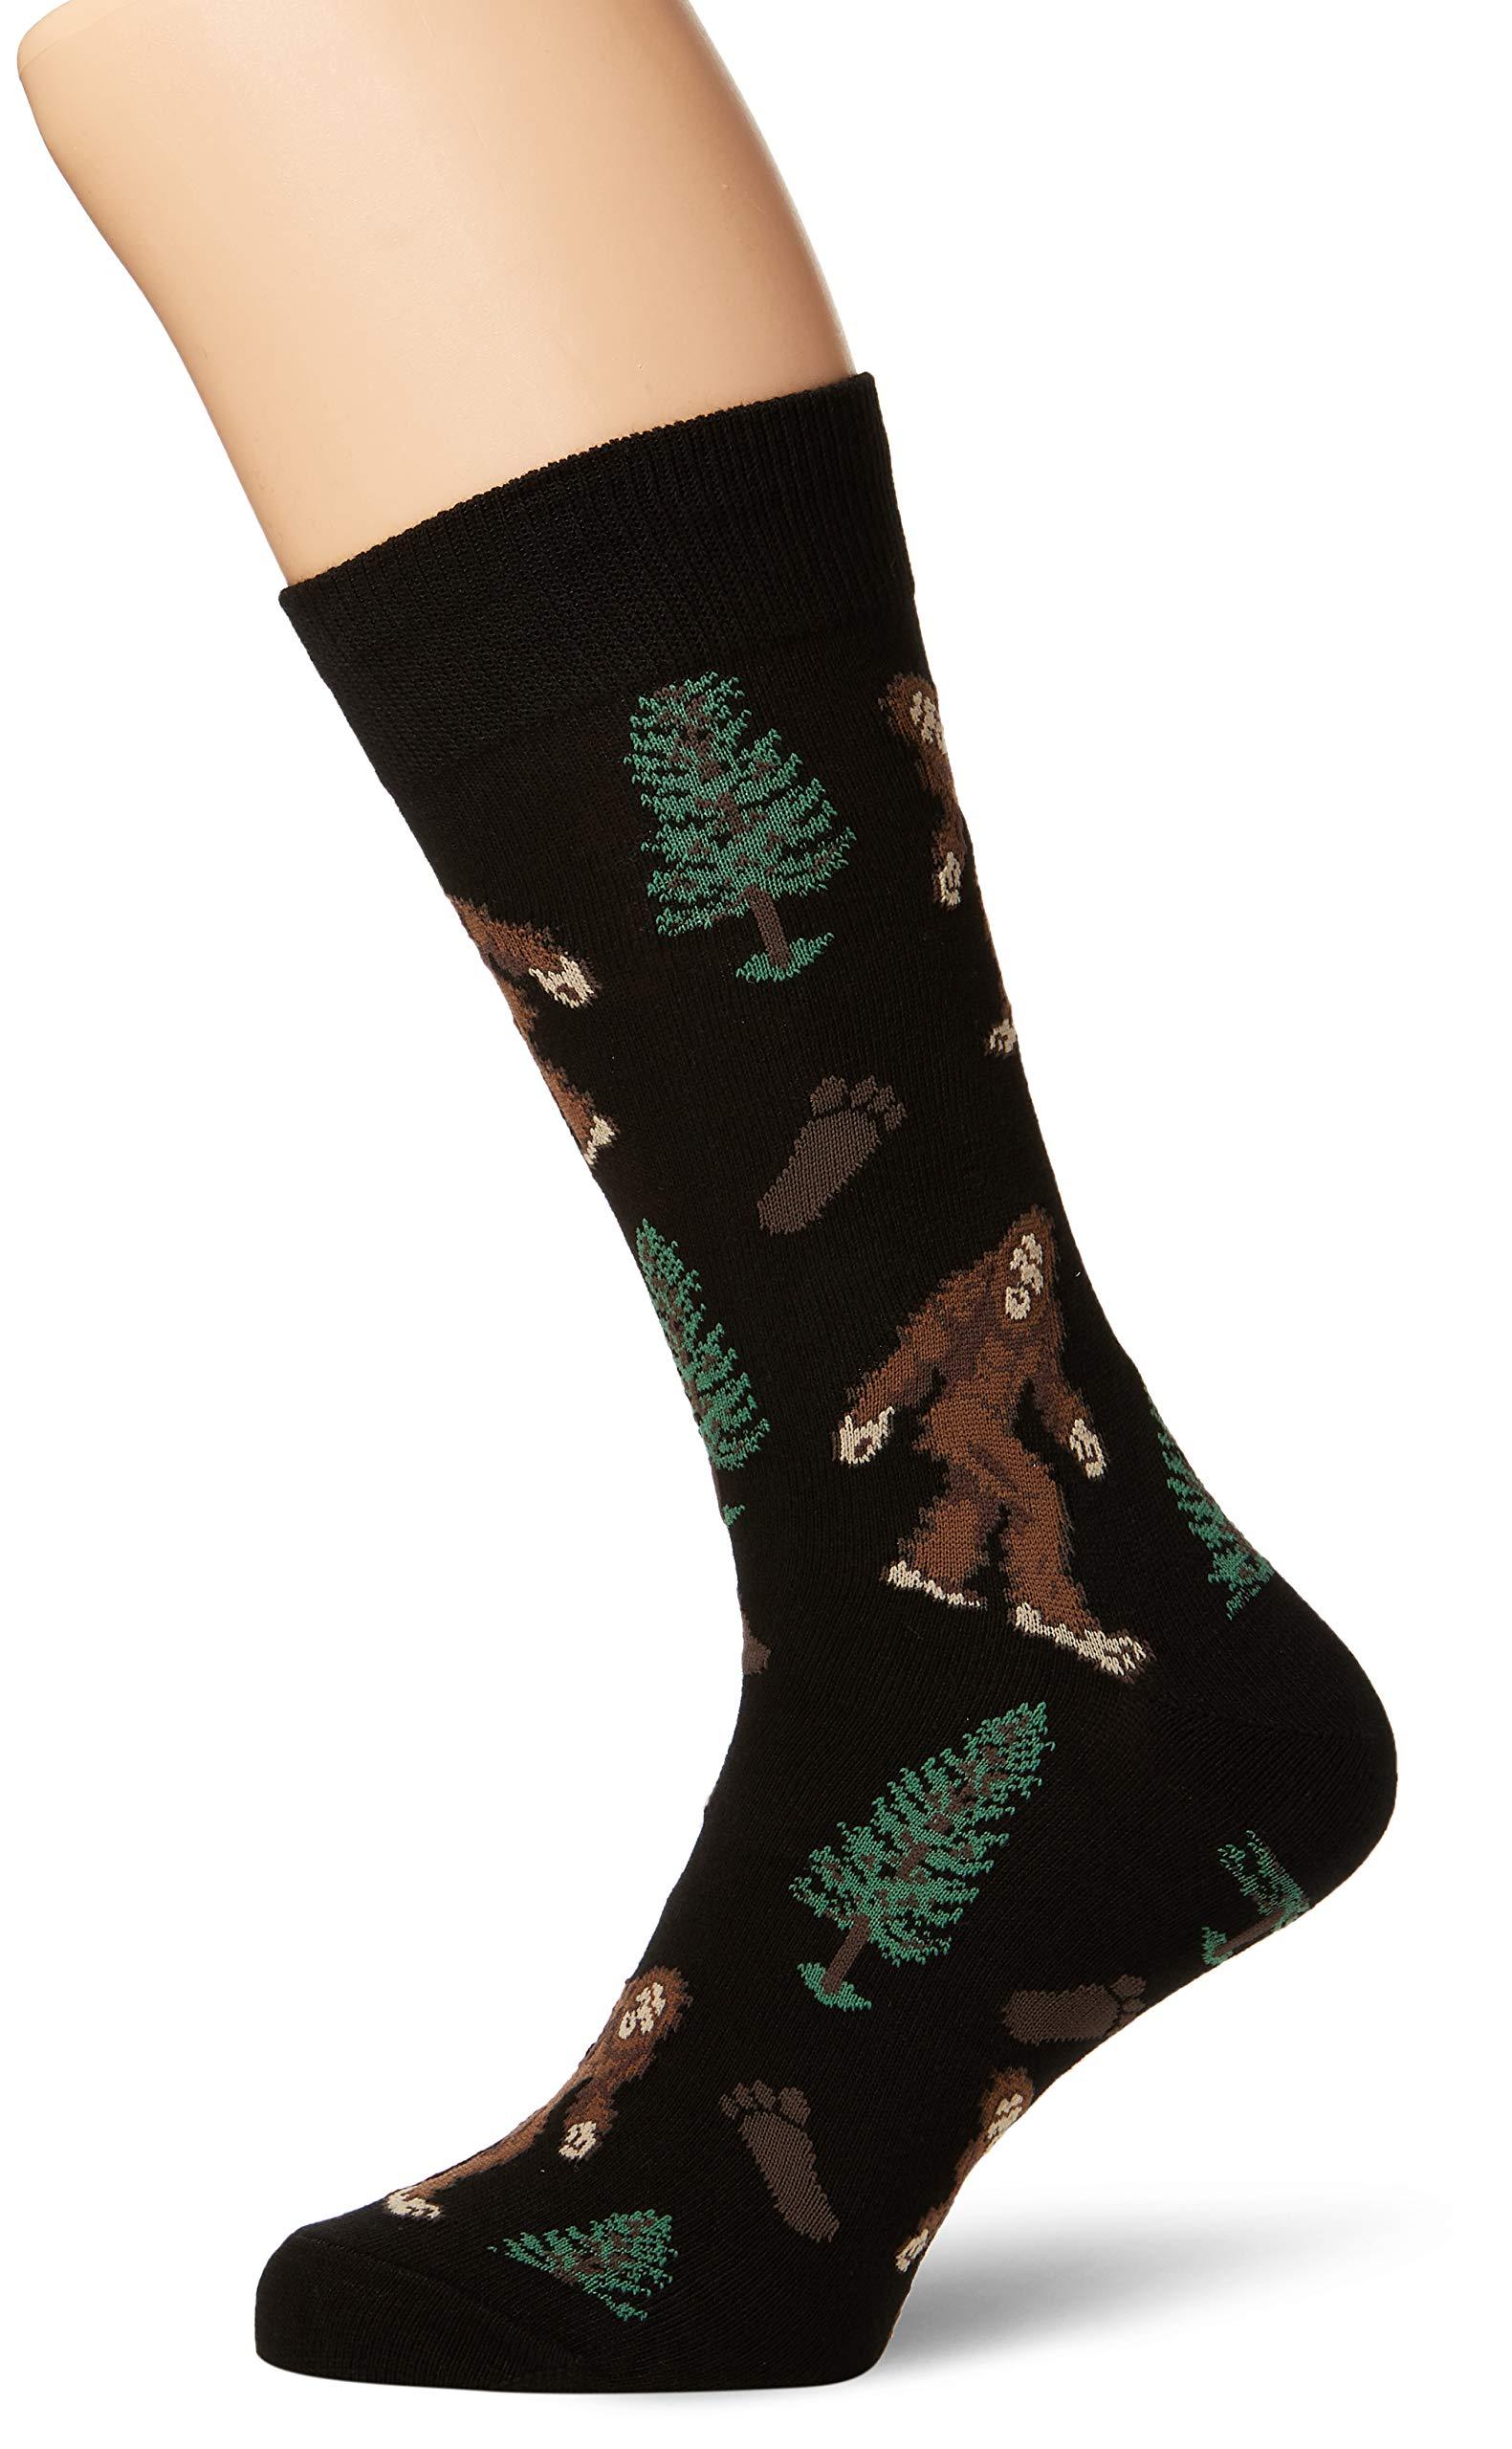 8ef50c722ab8d Socksmith Men's Socks Bigfoot Crew Black 1pair, one Size (10-13) product